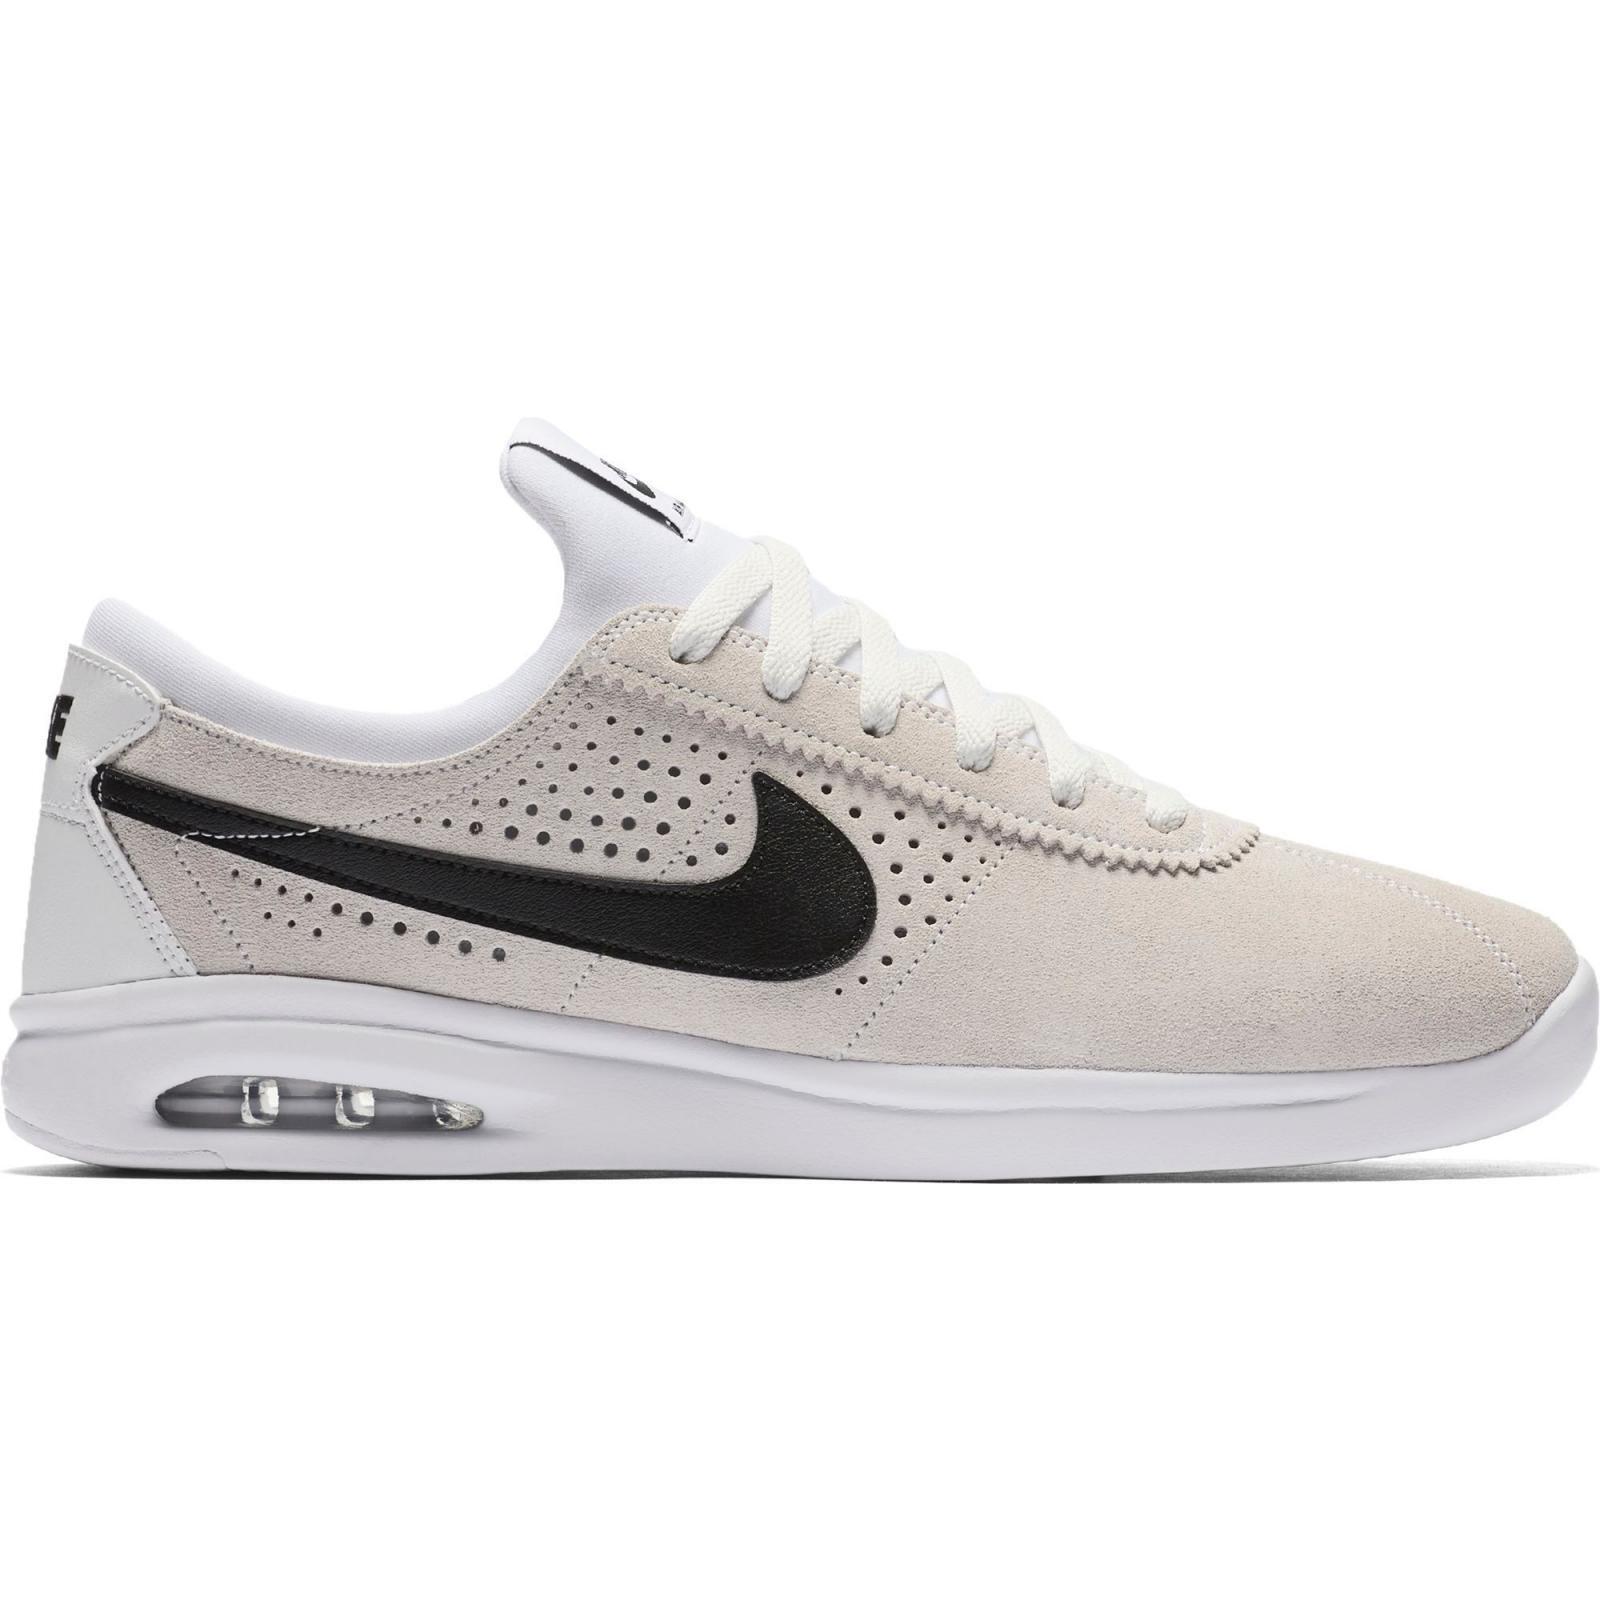 Herren Nike SB AIR MAX Bruin verdunsten Wildleder Turnschuhe 882097 101